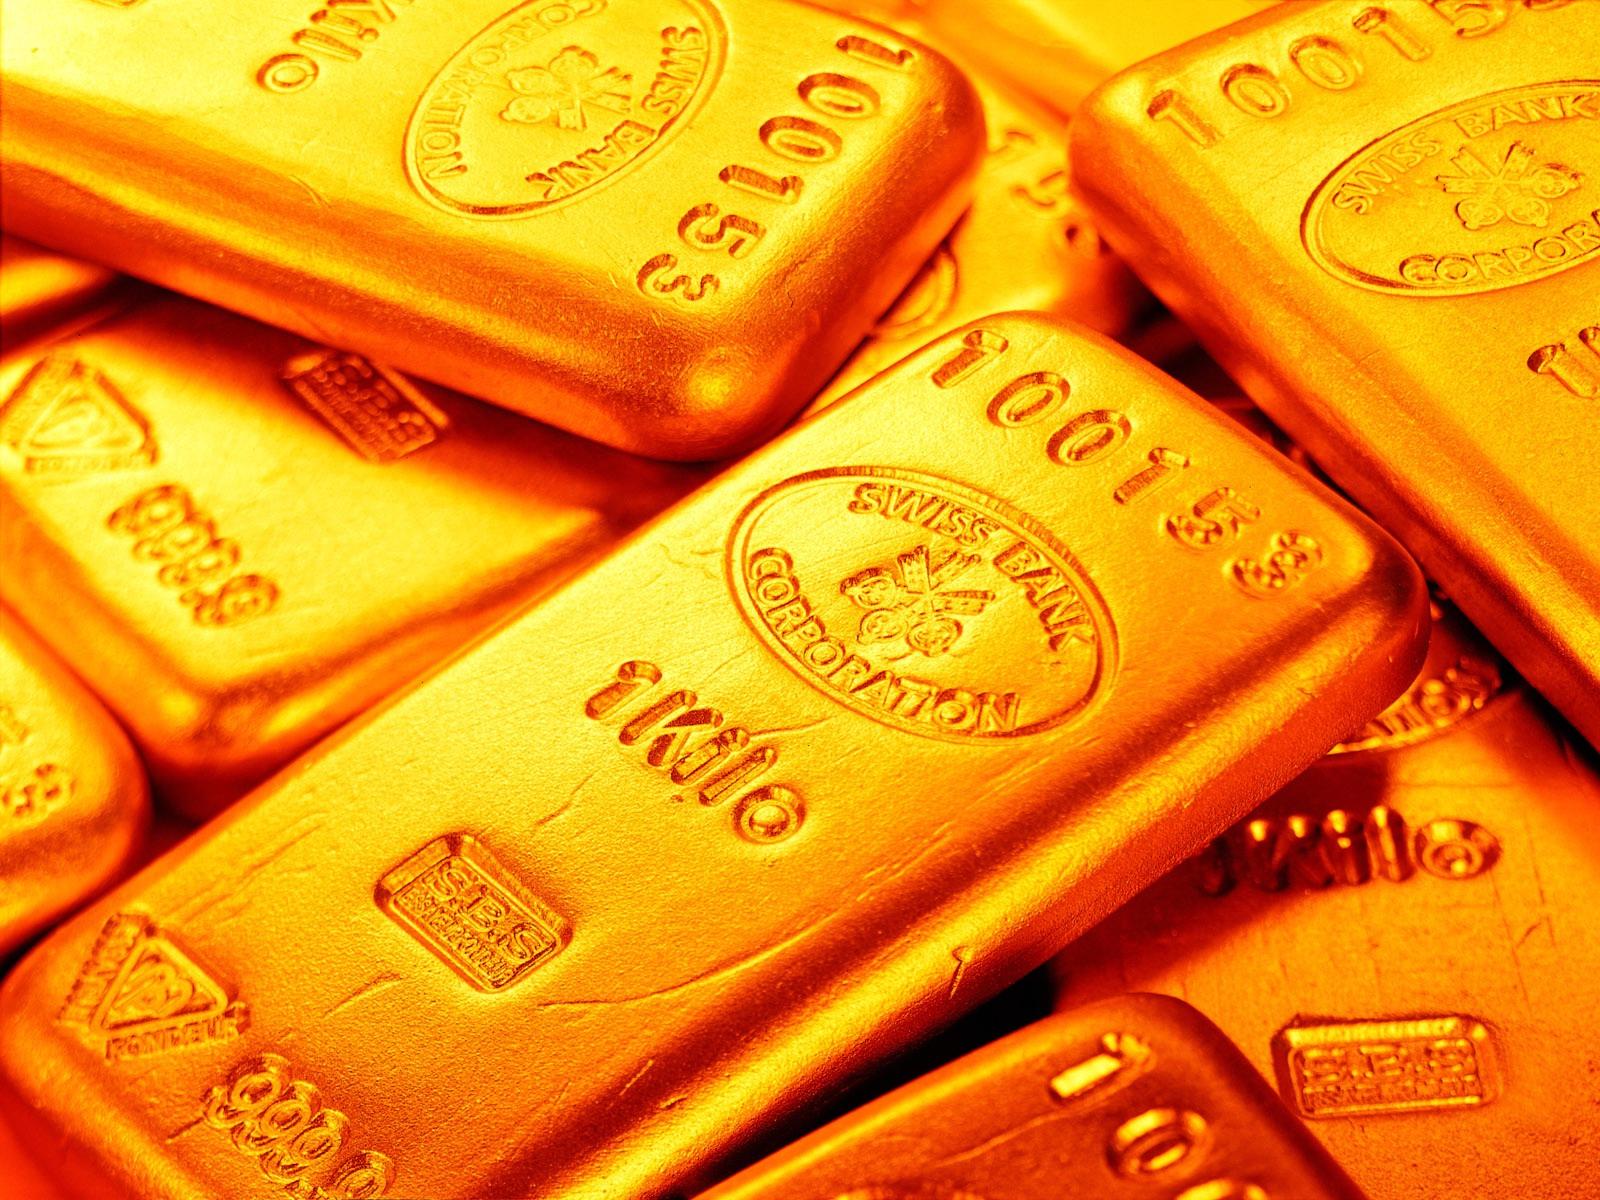 Gold Ingot Golden Wallpaper - Black and White Wallpapers HD